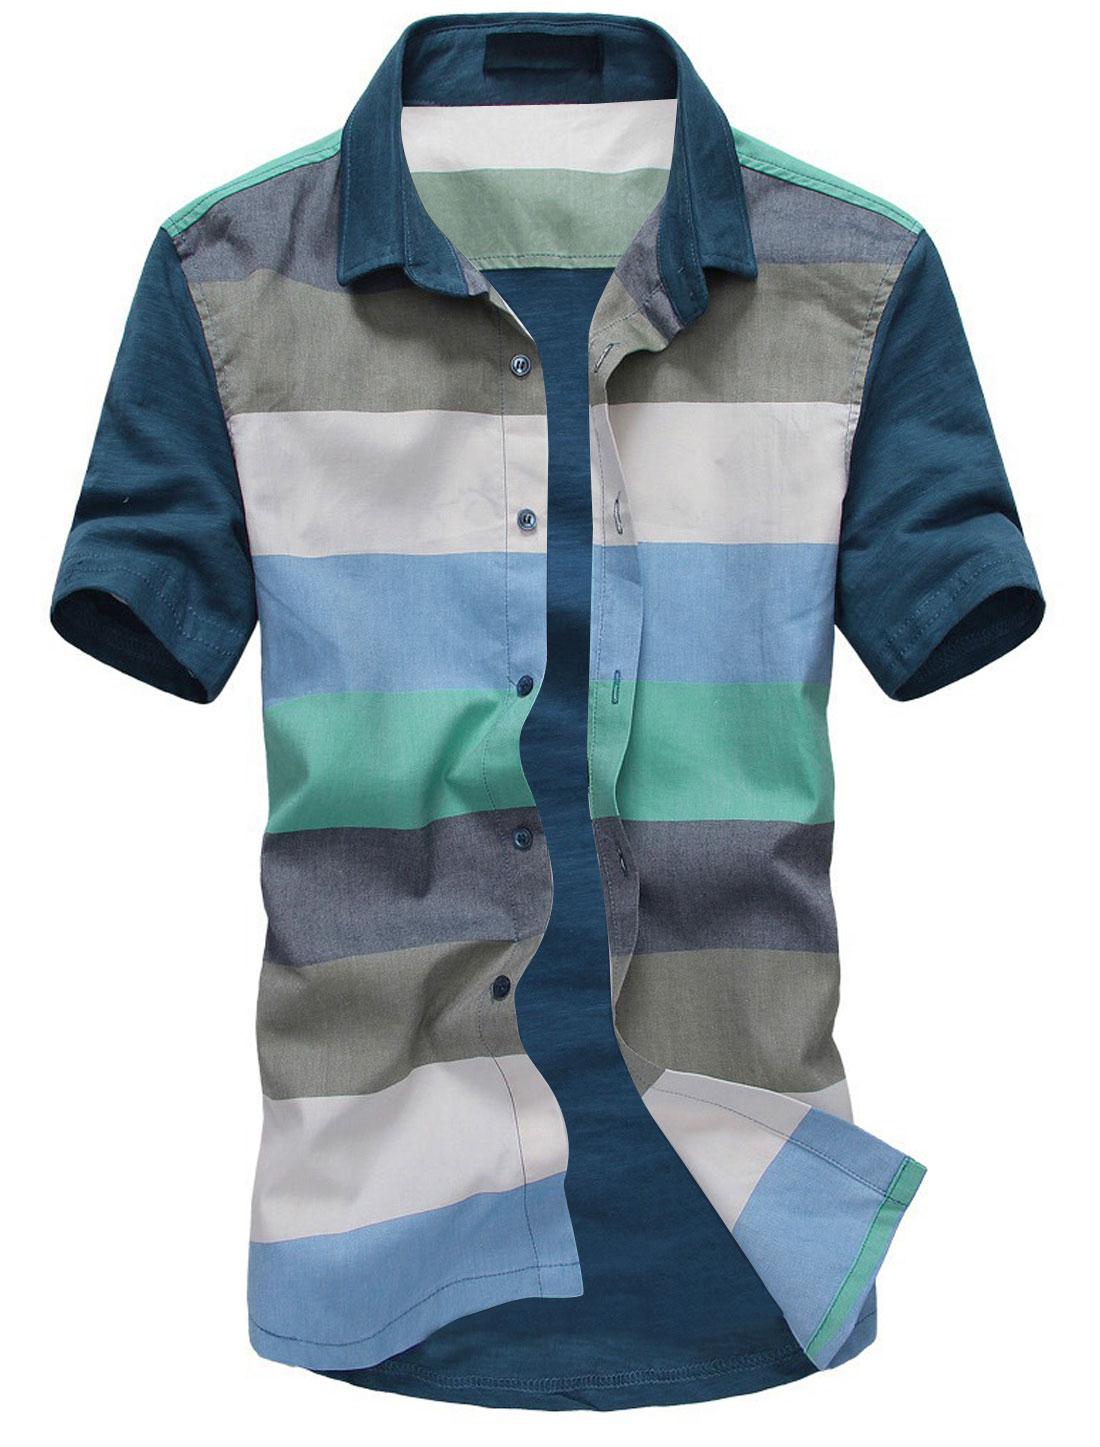 Men Point Collar Colorblock Slim Fit Top Shirt Light Blue Navy Blue S